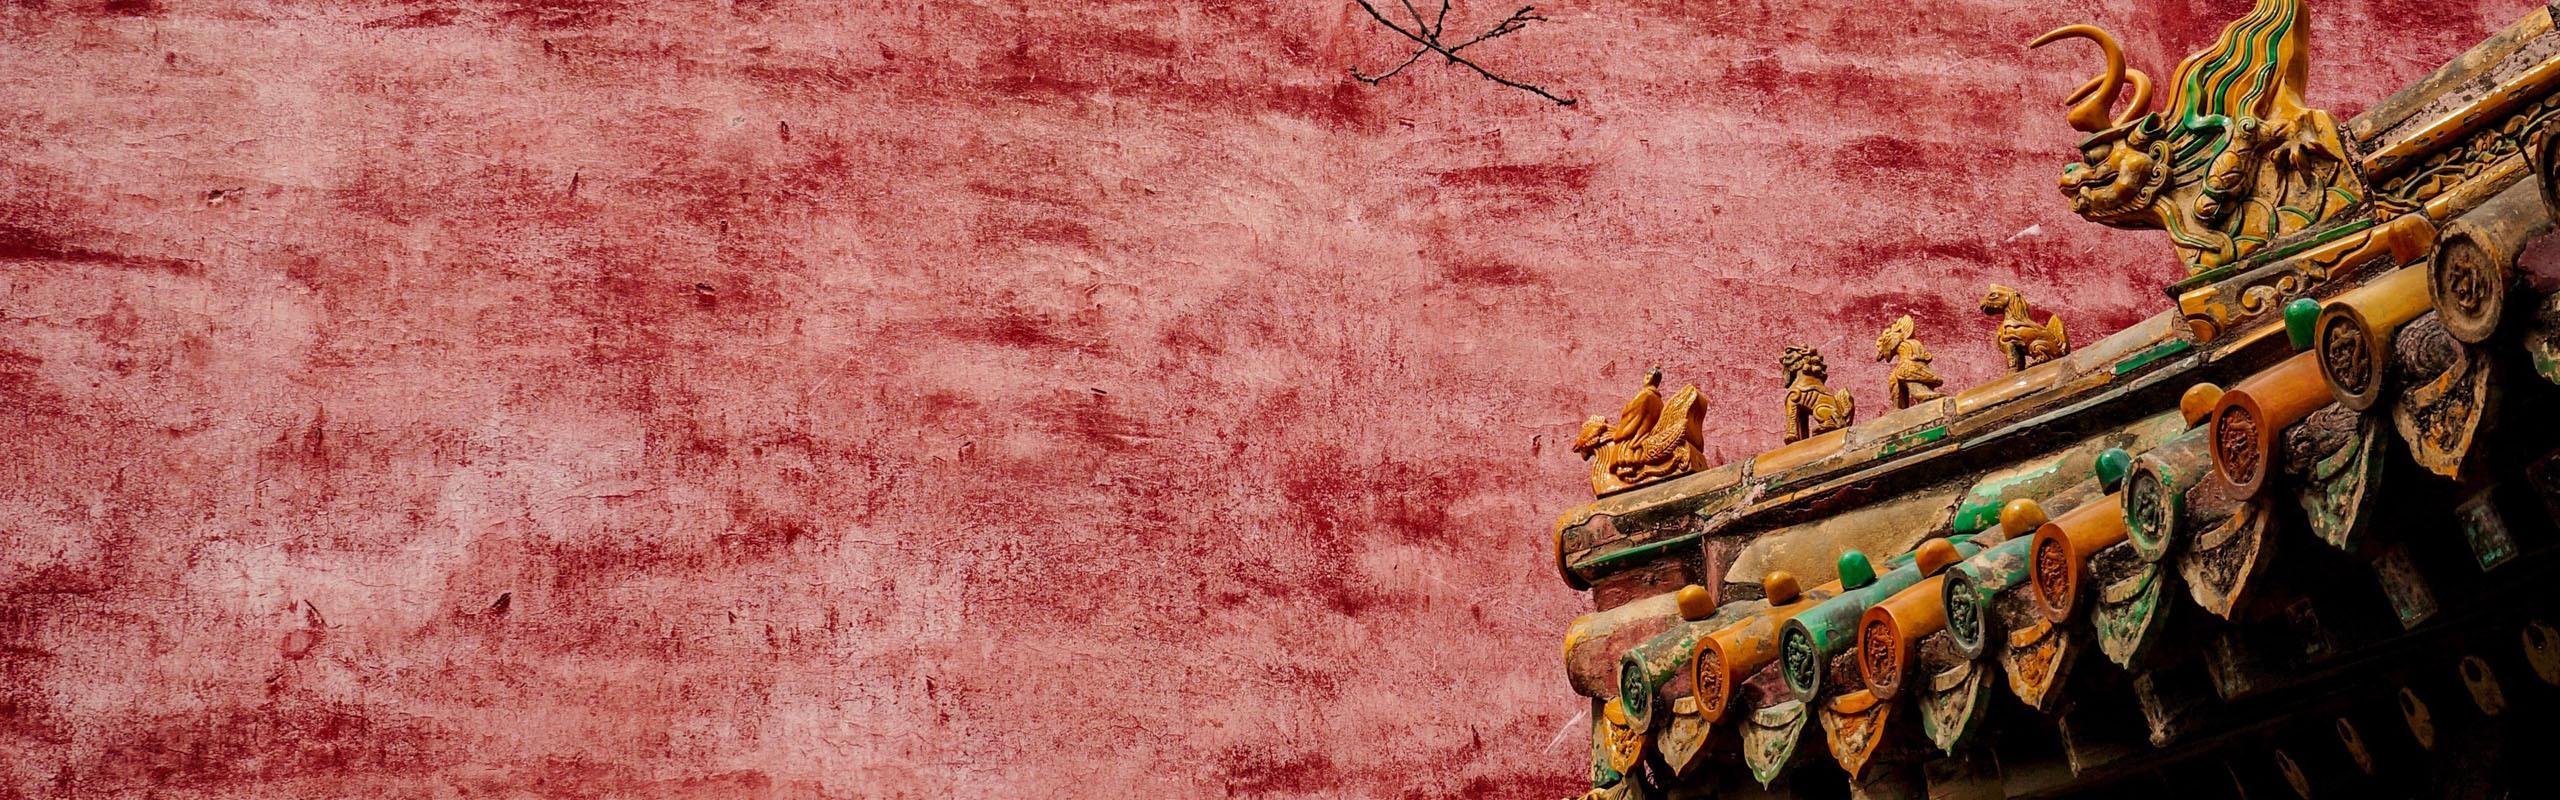 1-Day In-Depth Beijing Culture Tour